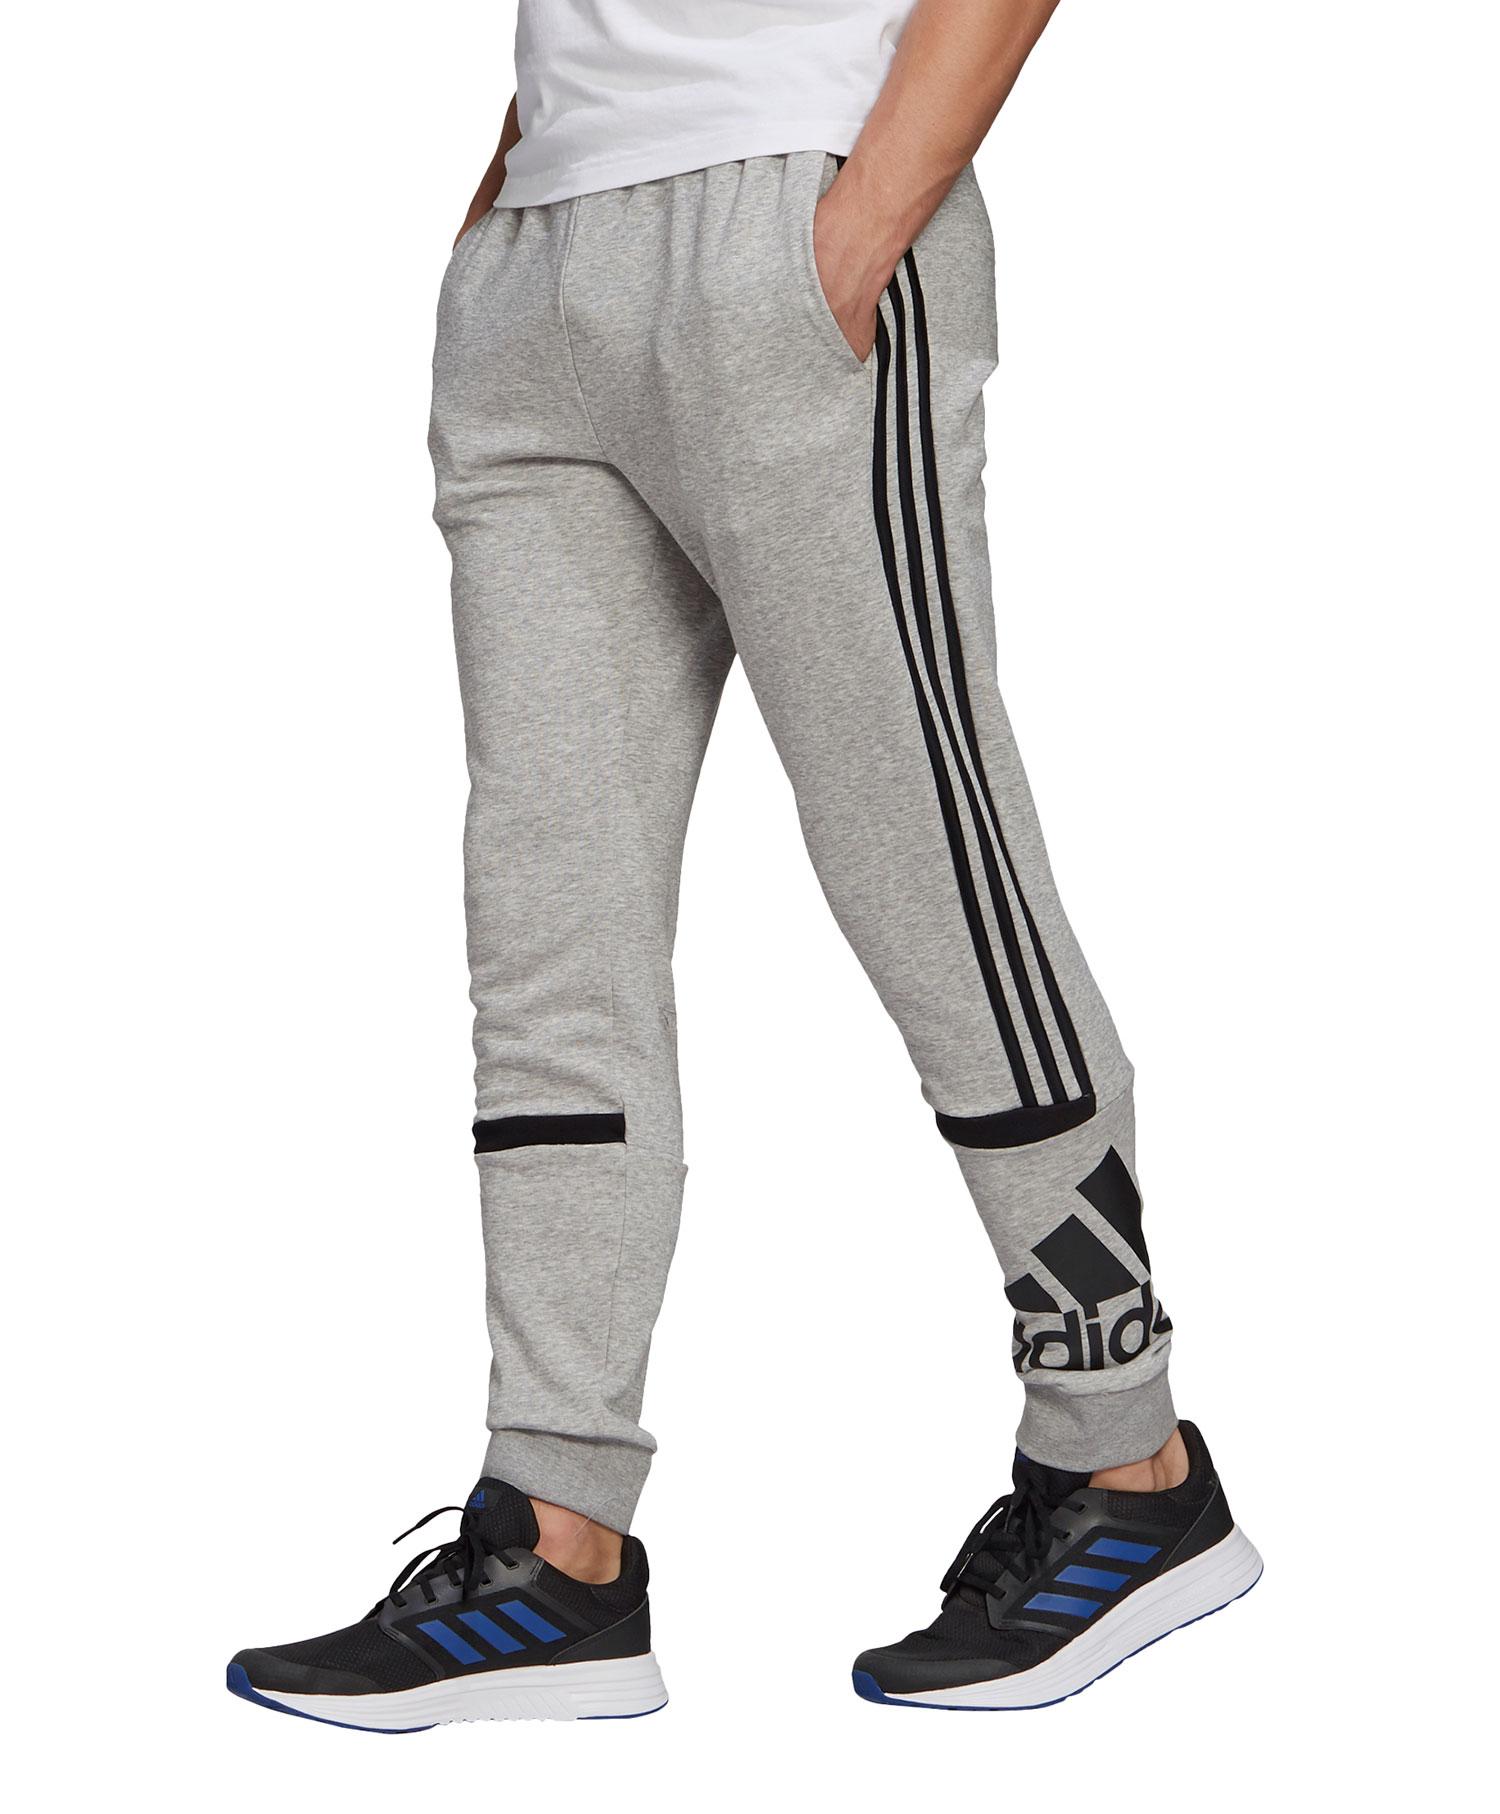 Adidas pt bukse